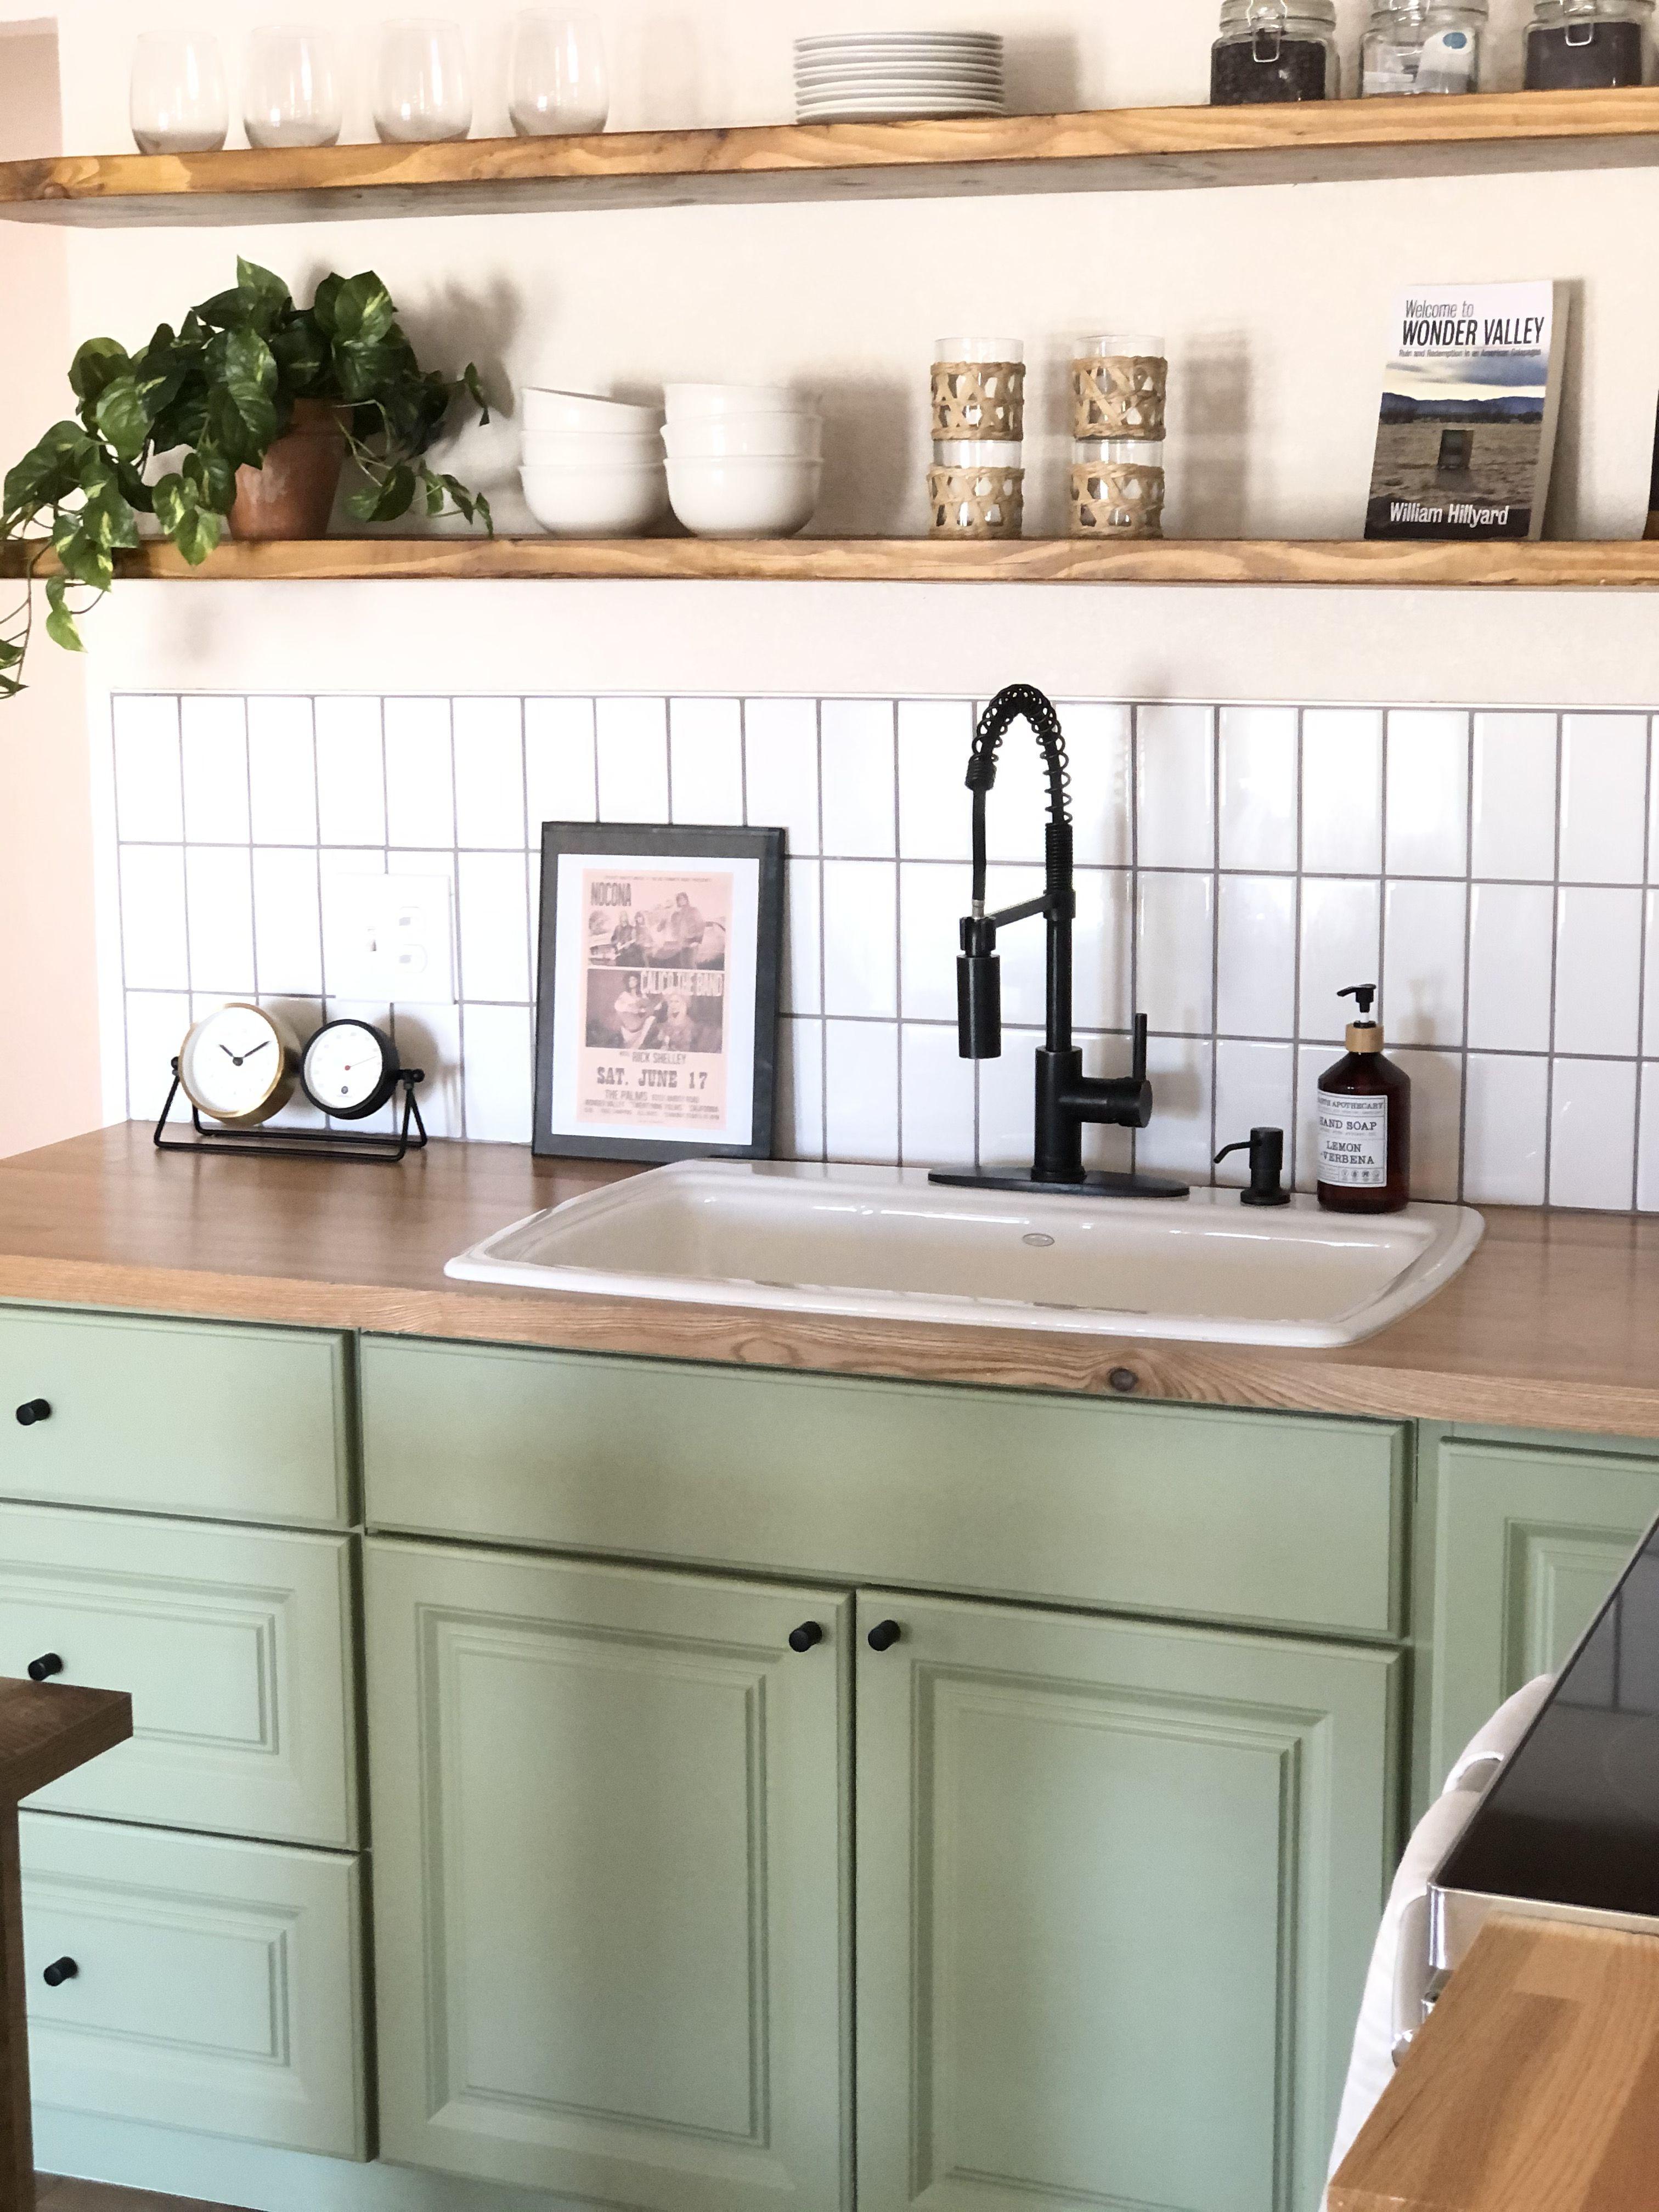 Butcher Block Counters W Open Shelving Green Cabinets Green Kitchen Cabinets Small Kitchen Cabinets Wood Countertops Kitchen